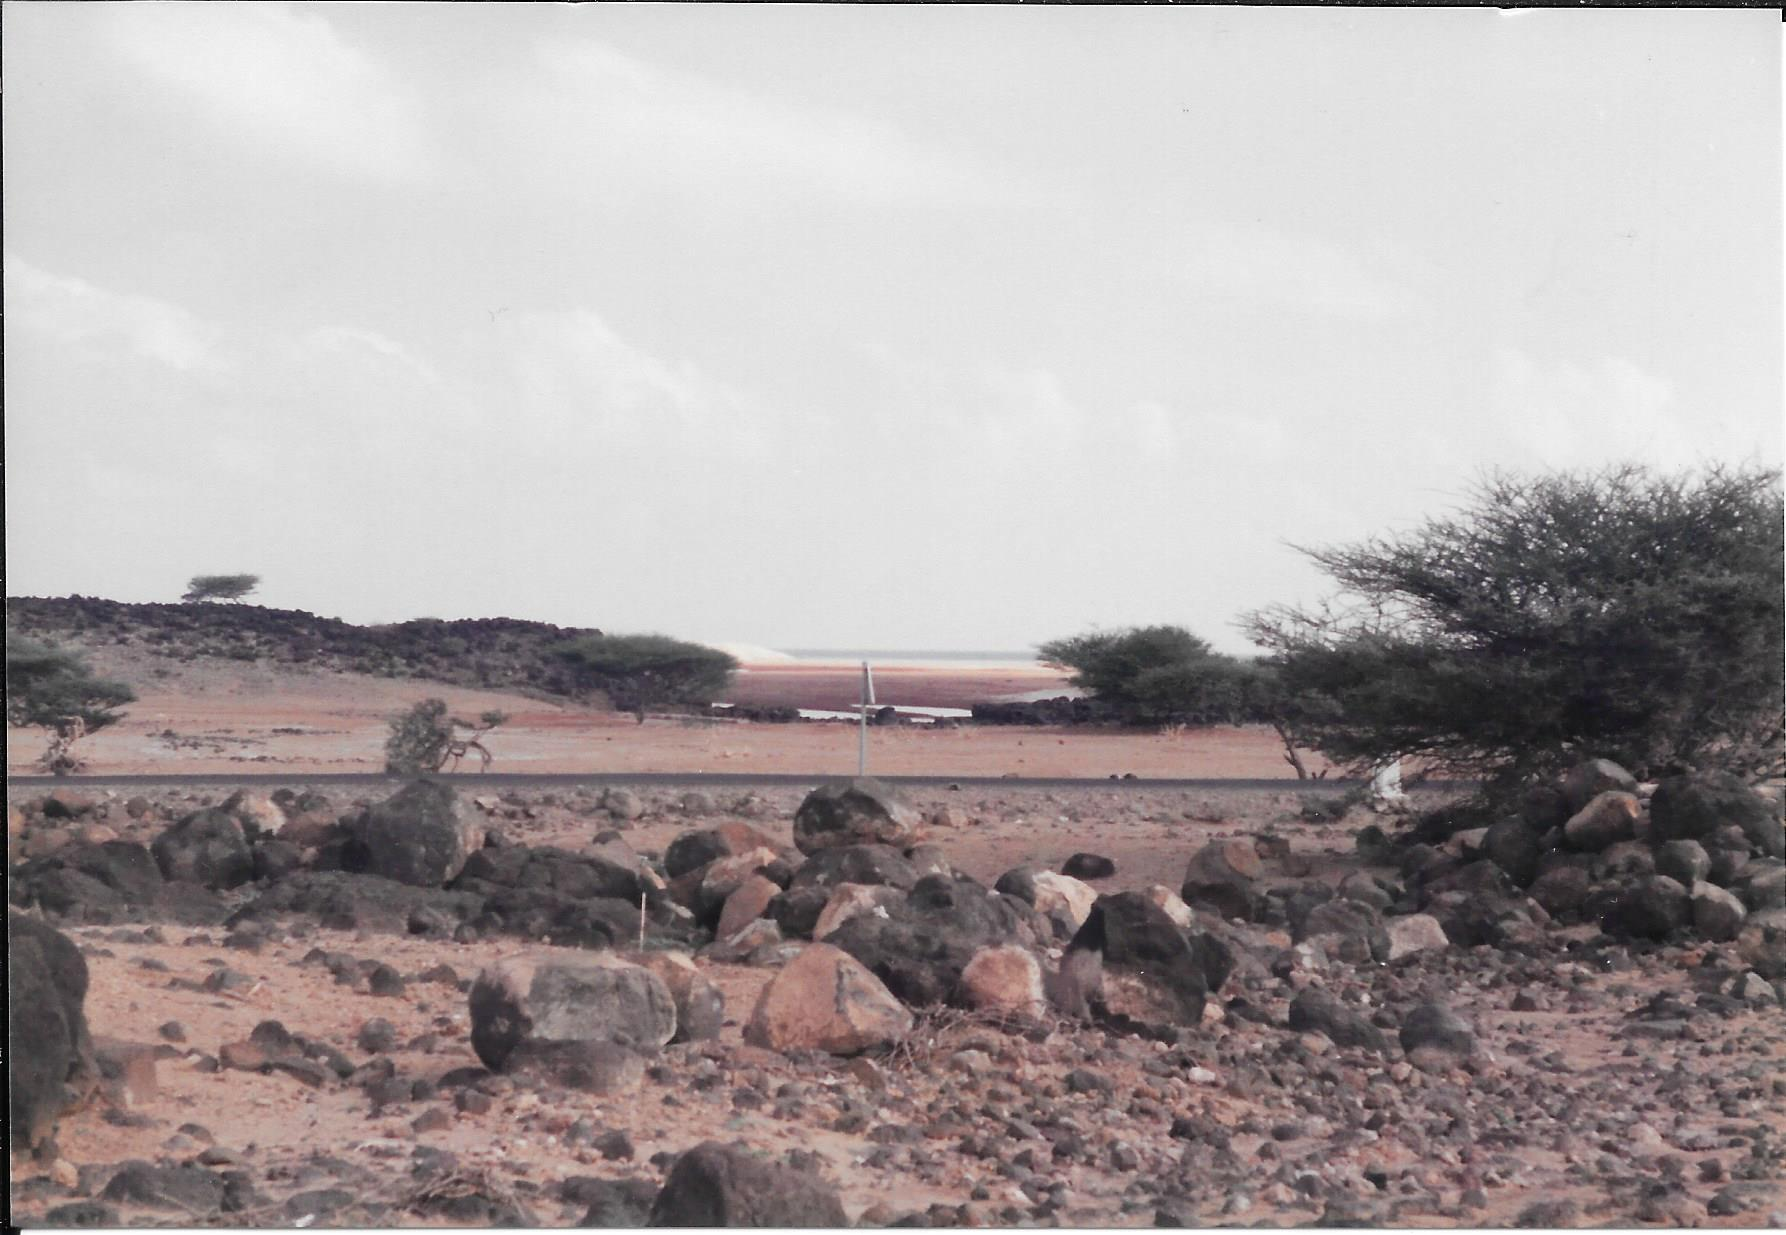 [Campagne] DJIBOUTI - TOME 1 - Page 21 312